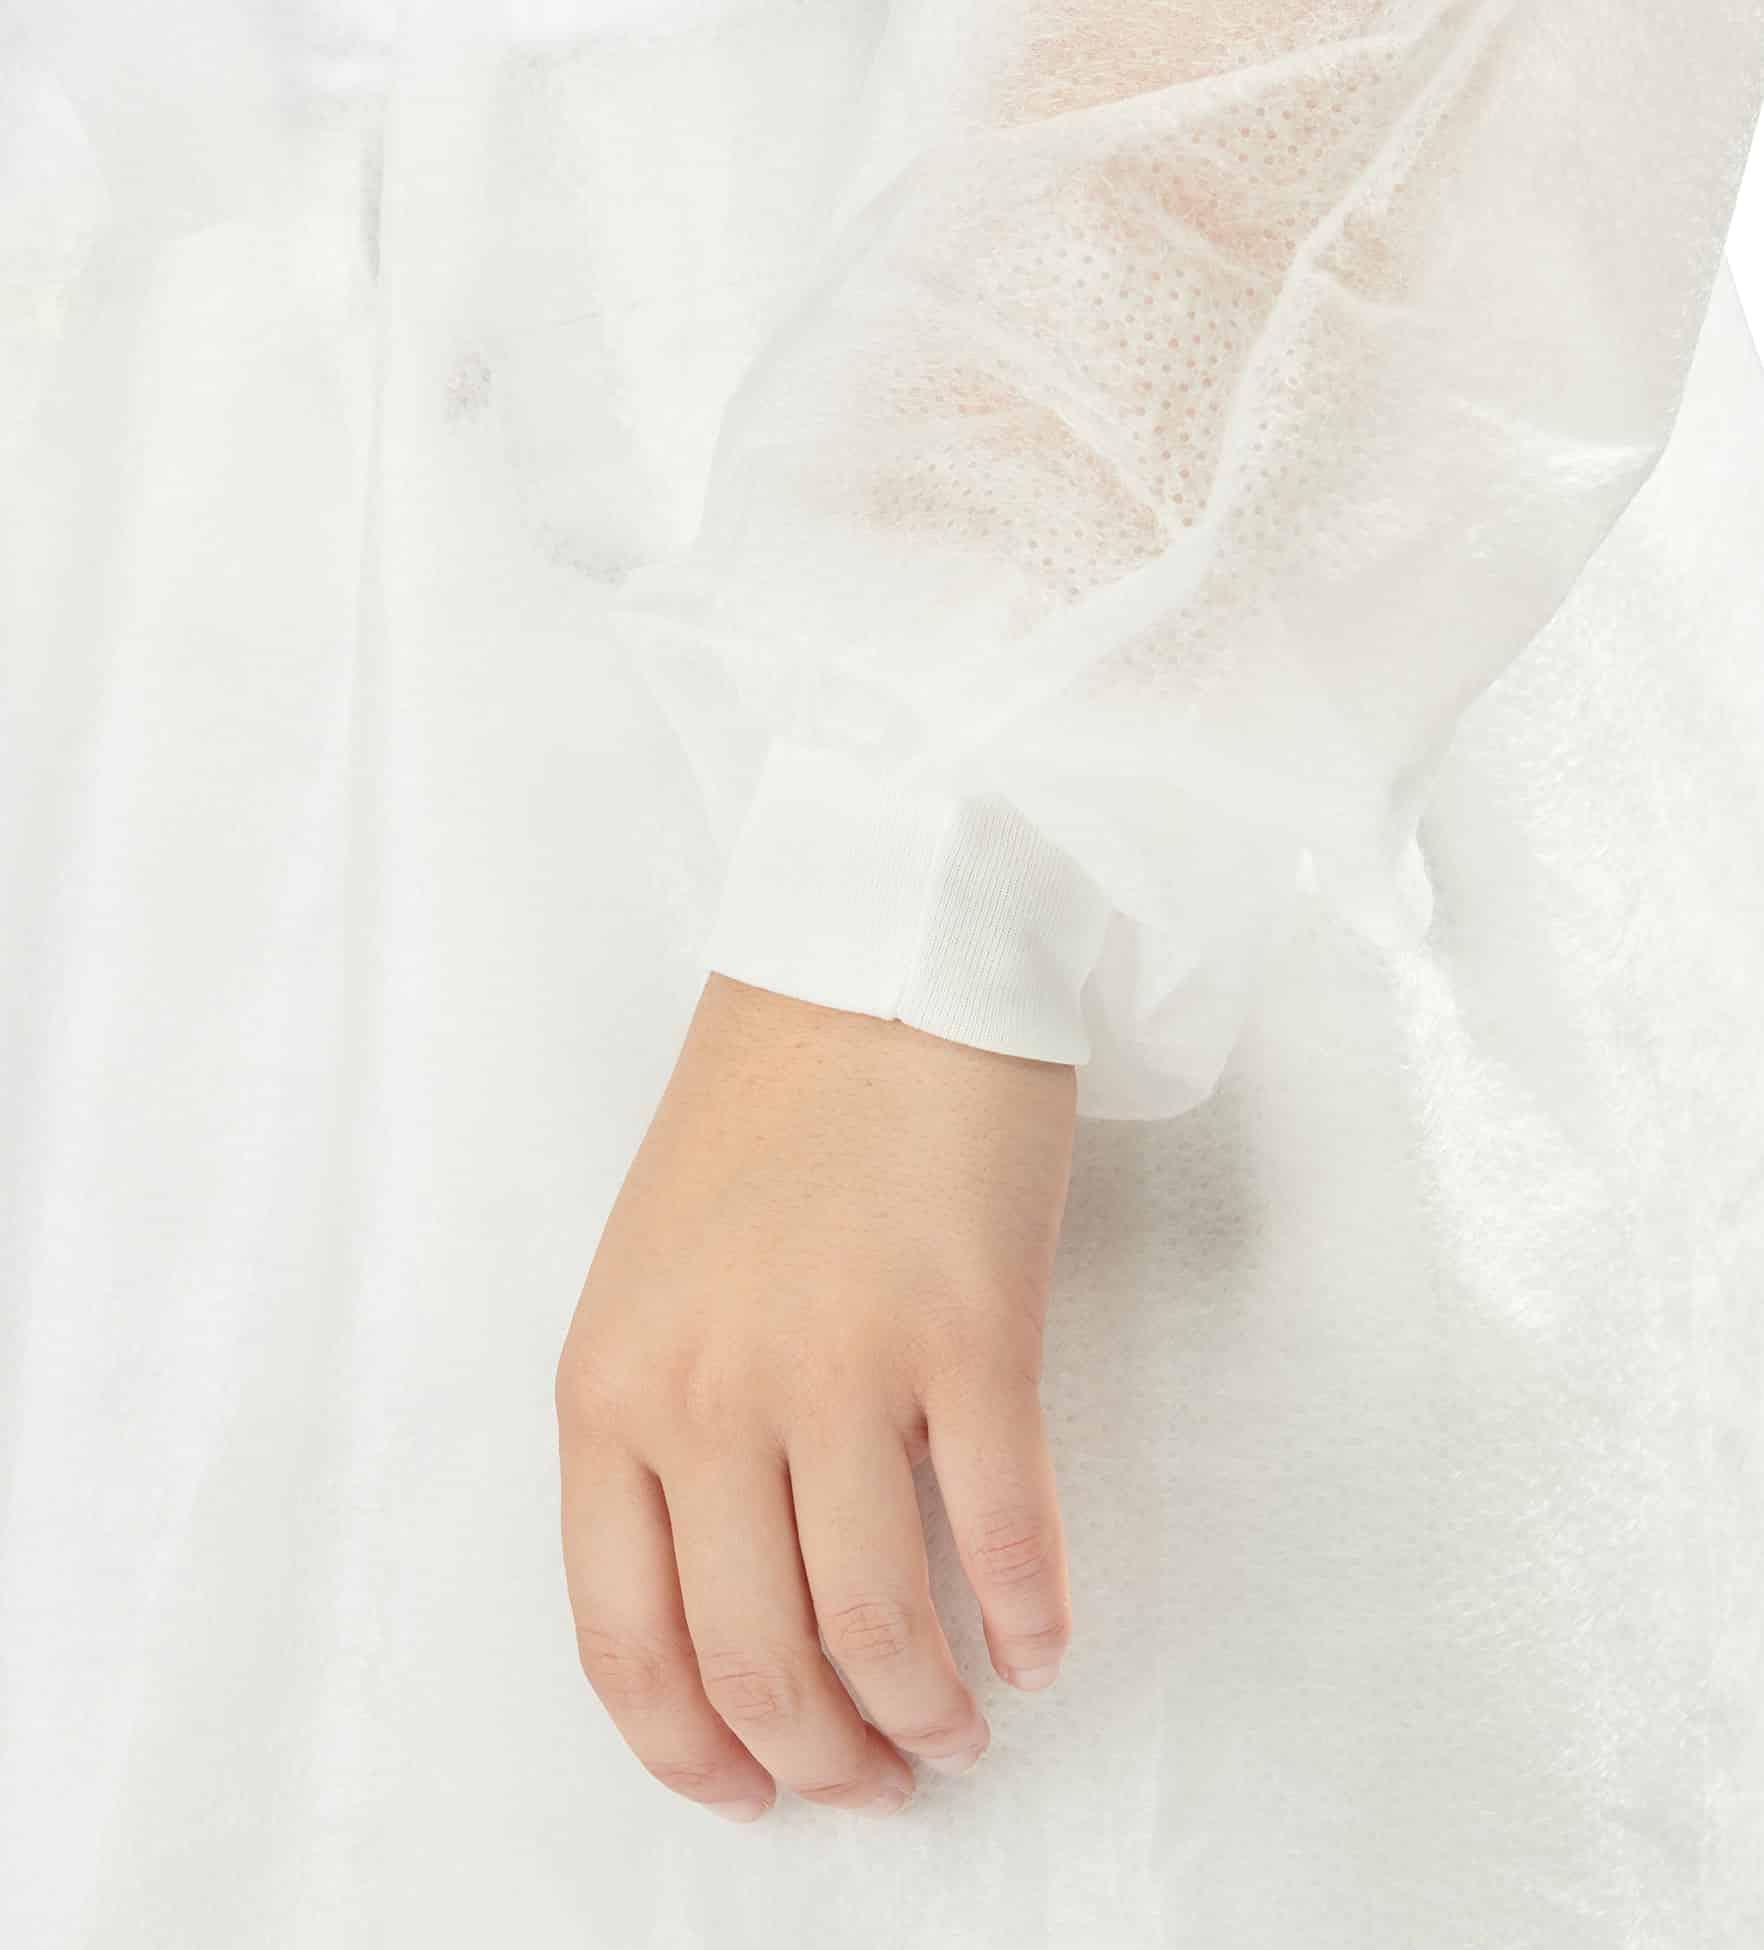 batas hidrófugas 25g 10 - 25g water repellent gowns - clothe protect